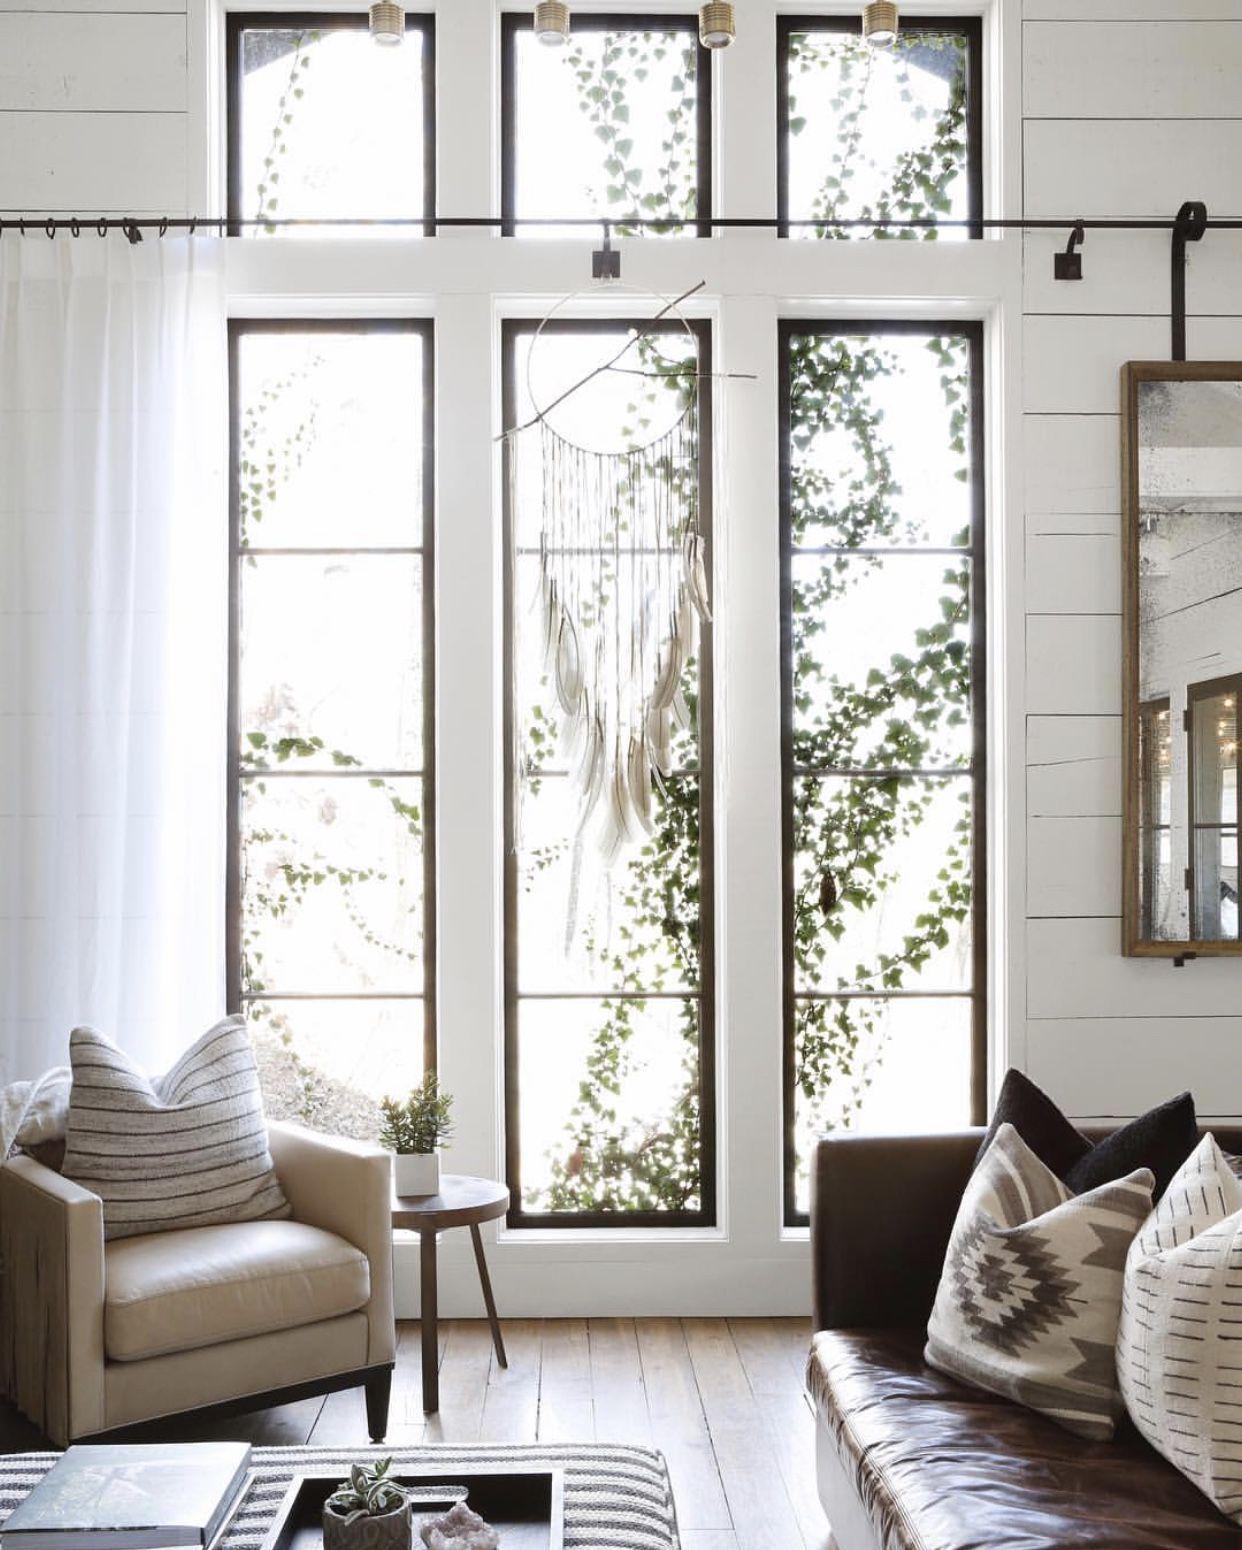 Amazing Floor To Ceiling Windows Ideas In Modern Dwellings Living Room Ceiling Big Living Rooms Floor To Ceiling Windows